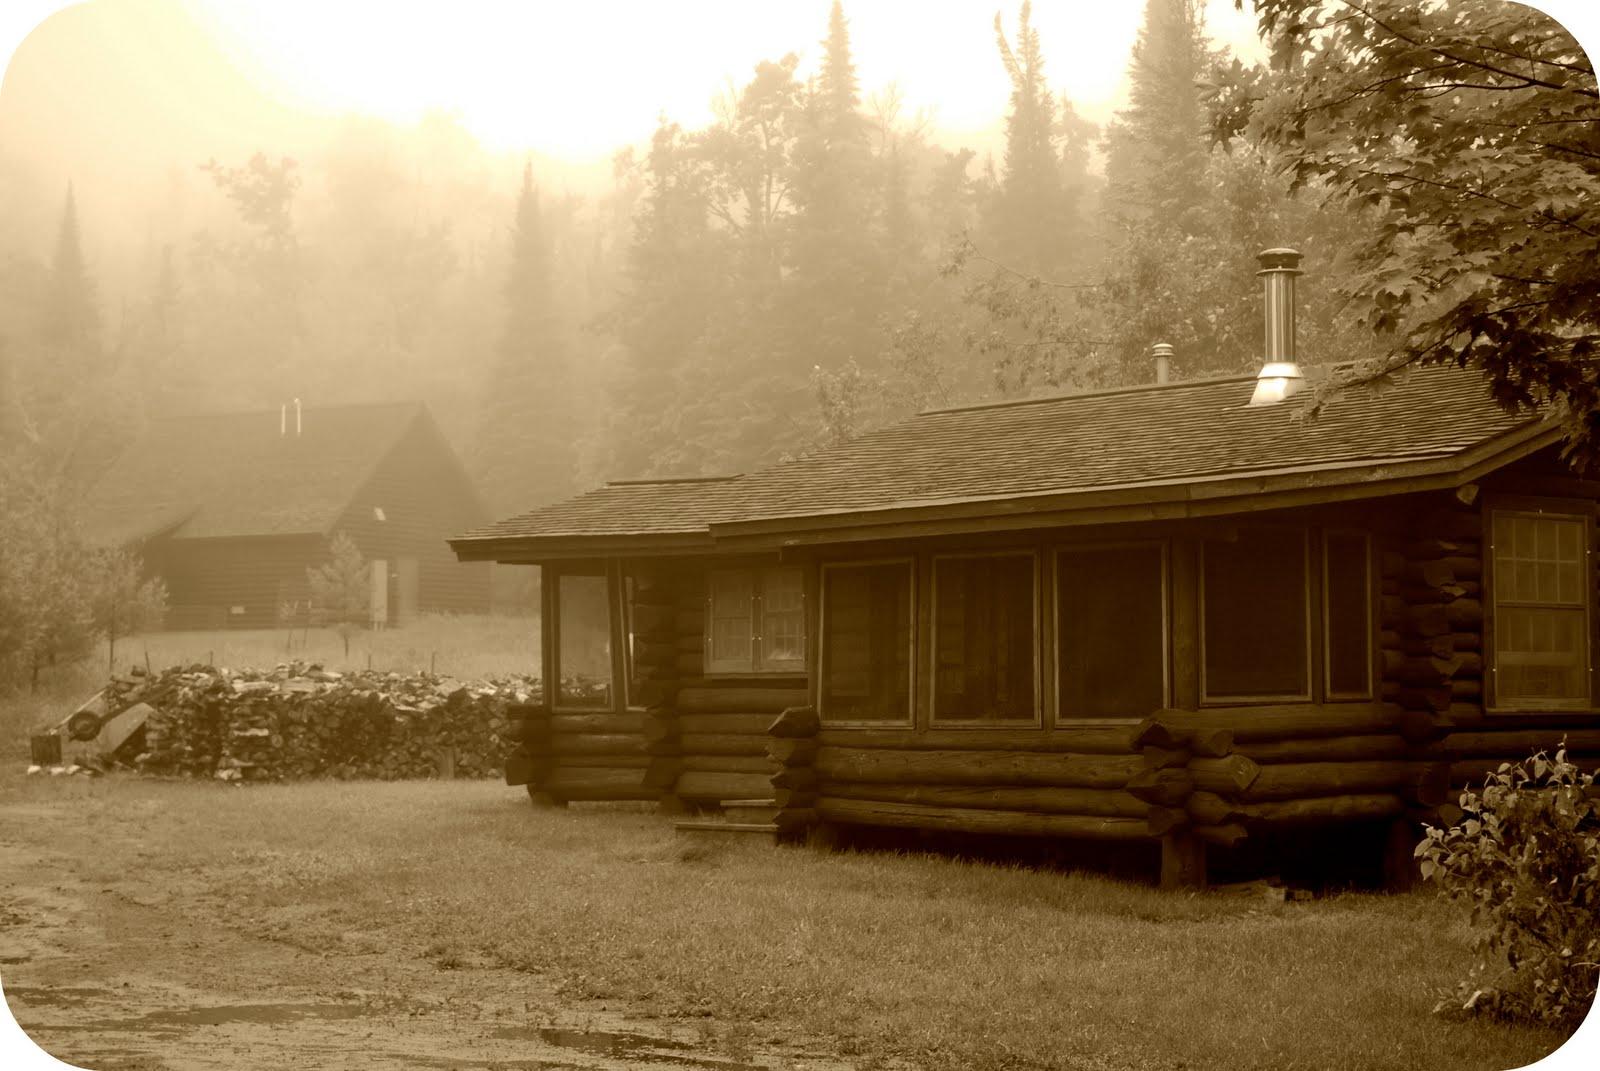 Chez Beeper Bebe Tettegouche Camp